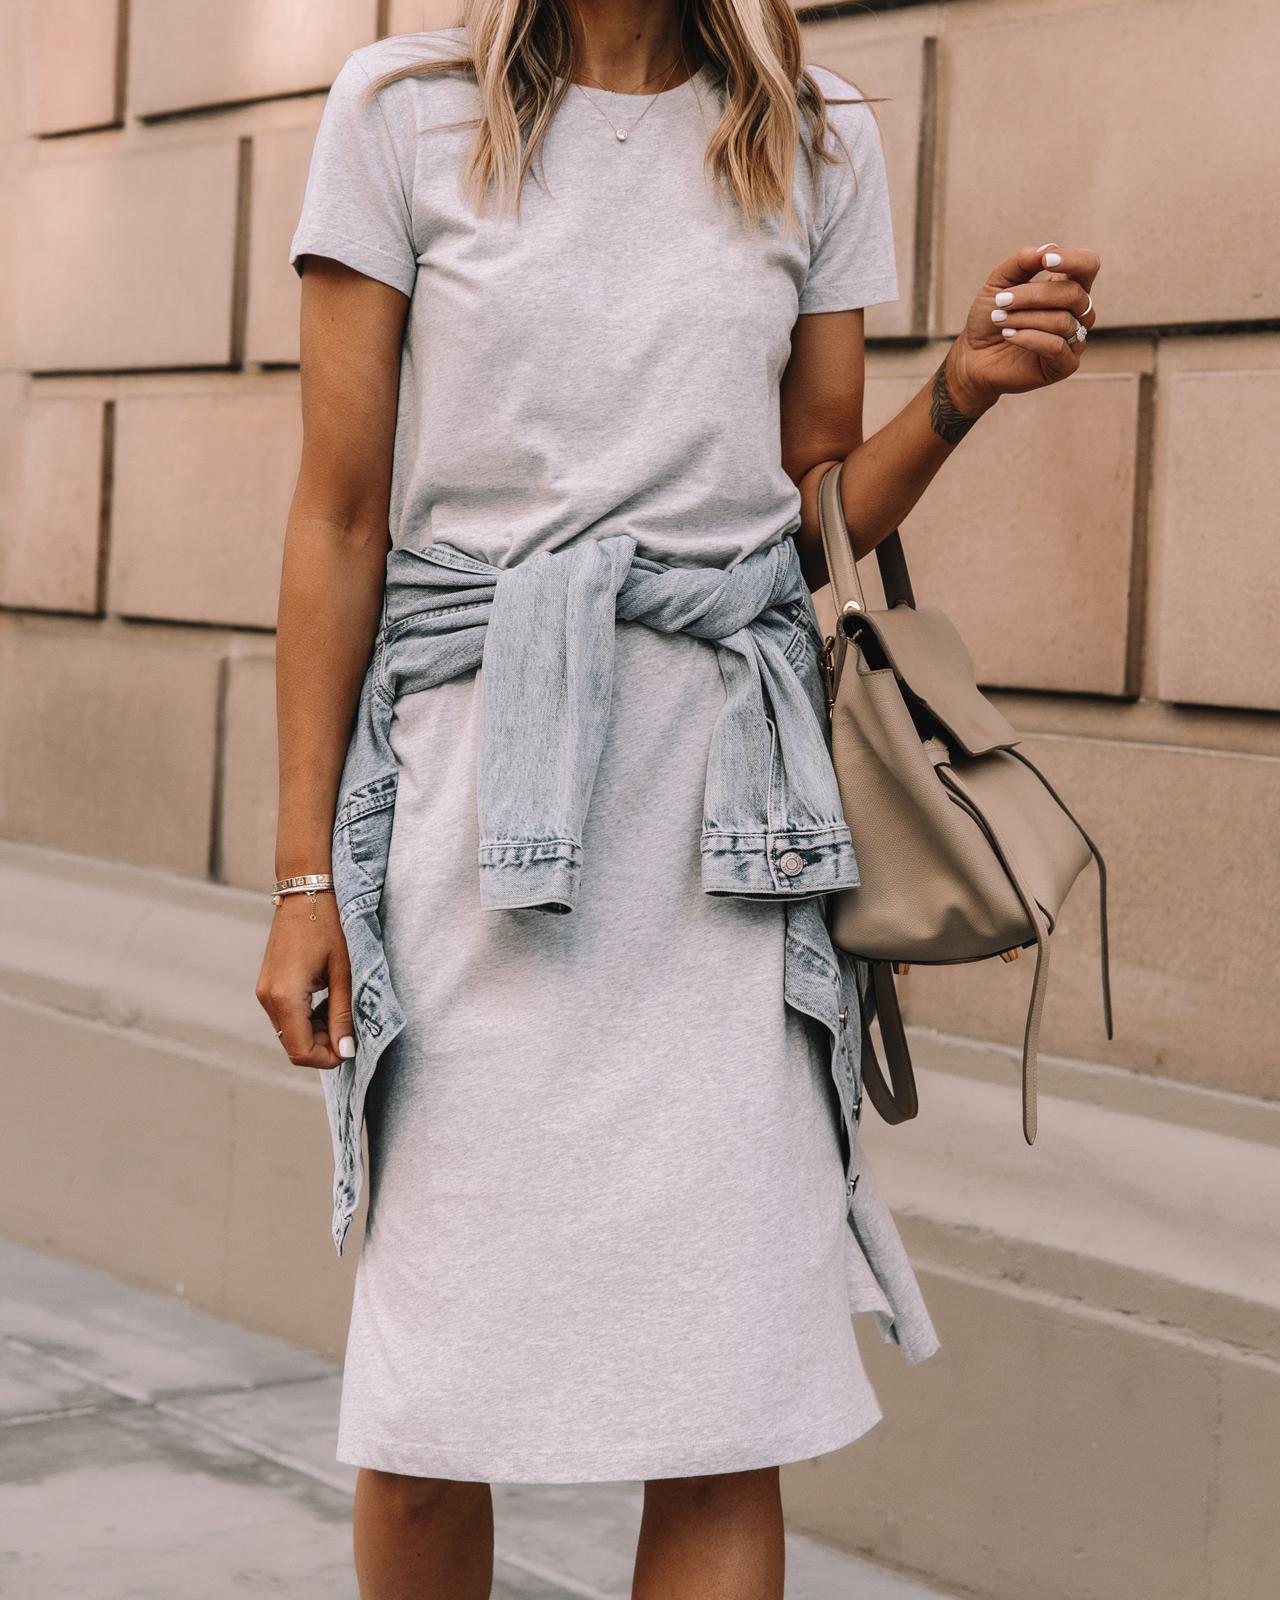 Fashion Jackson Wearing Jcrew Grey Midi Tshirt Dress Denim Jacket Celine Belt Bag 2